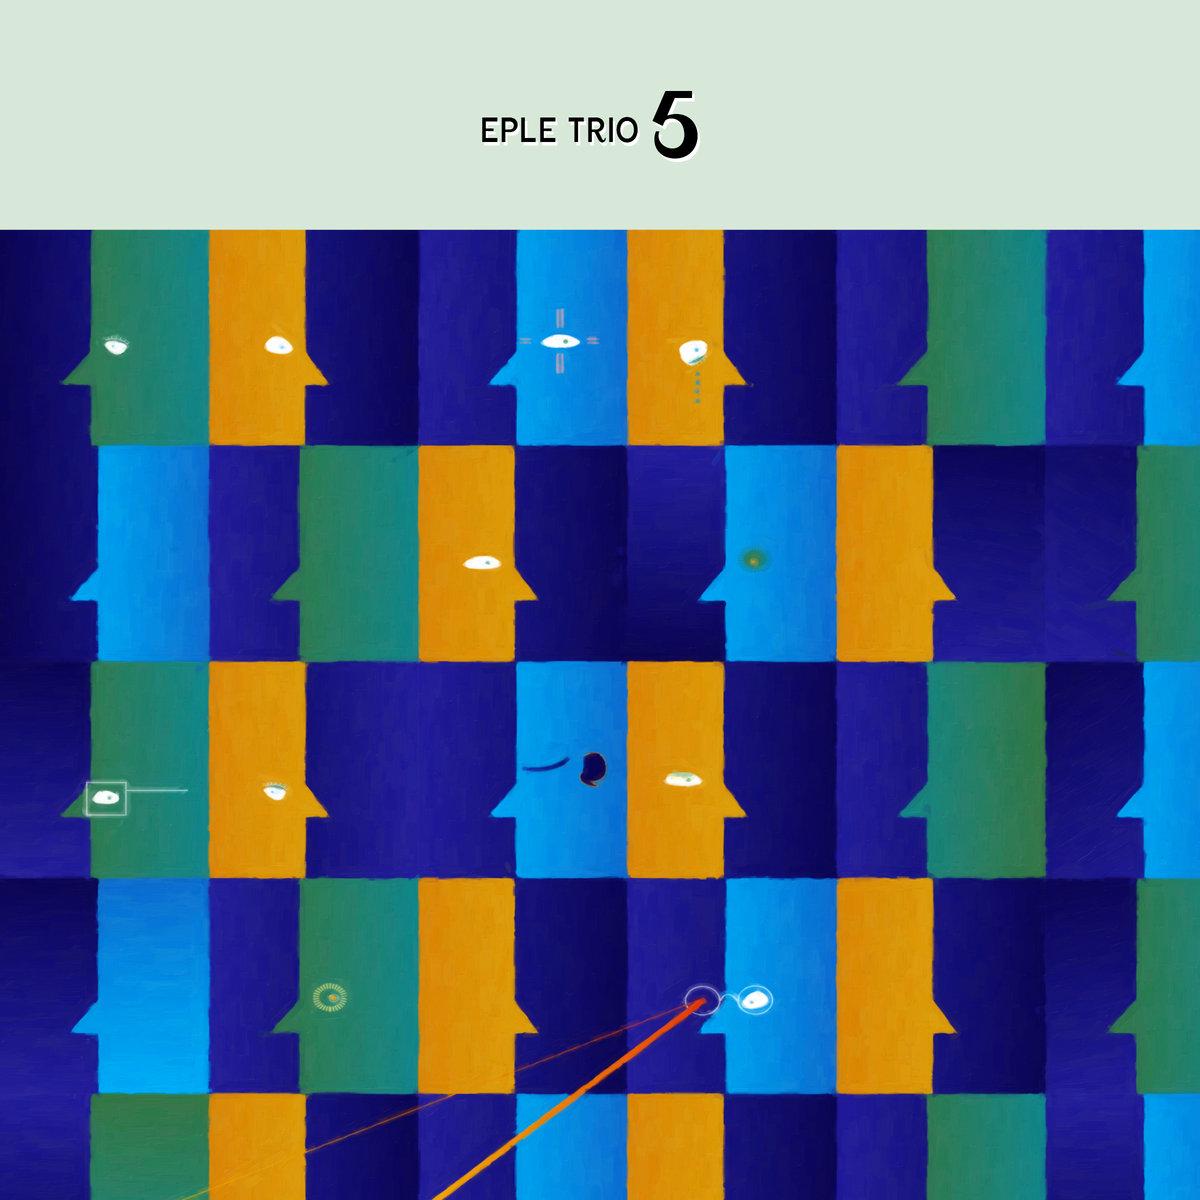 Eple Trio 5